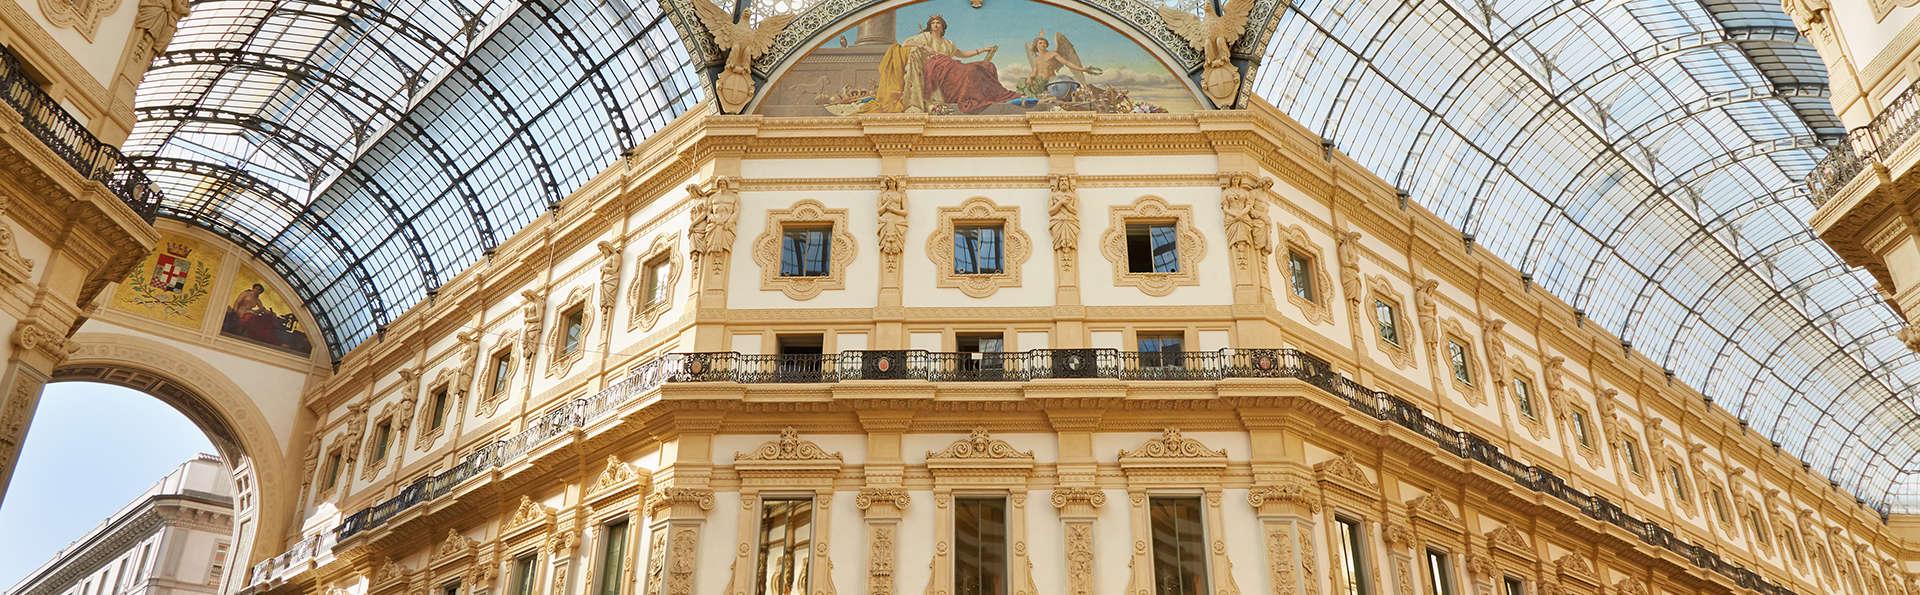 Hotel La Torretta - edit_milan1.jpg